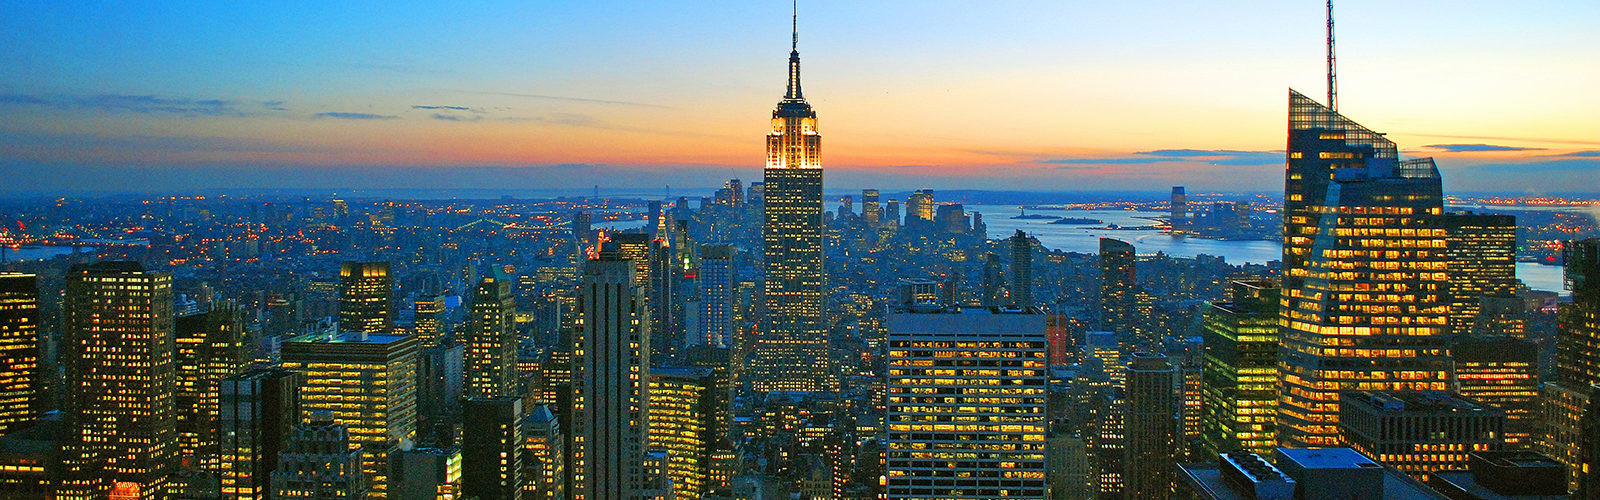 new-york-chiffres